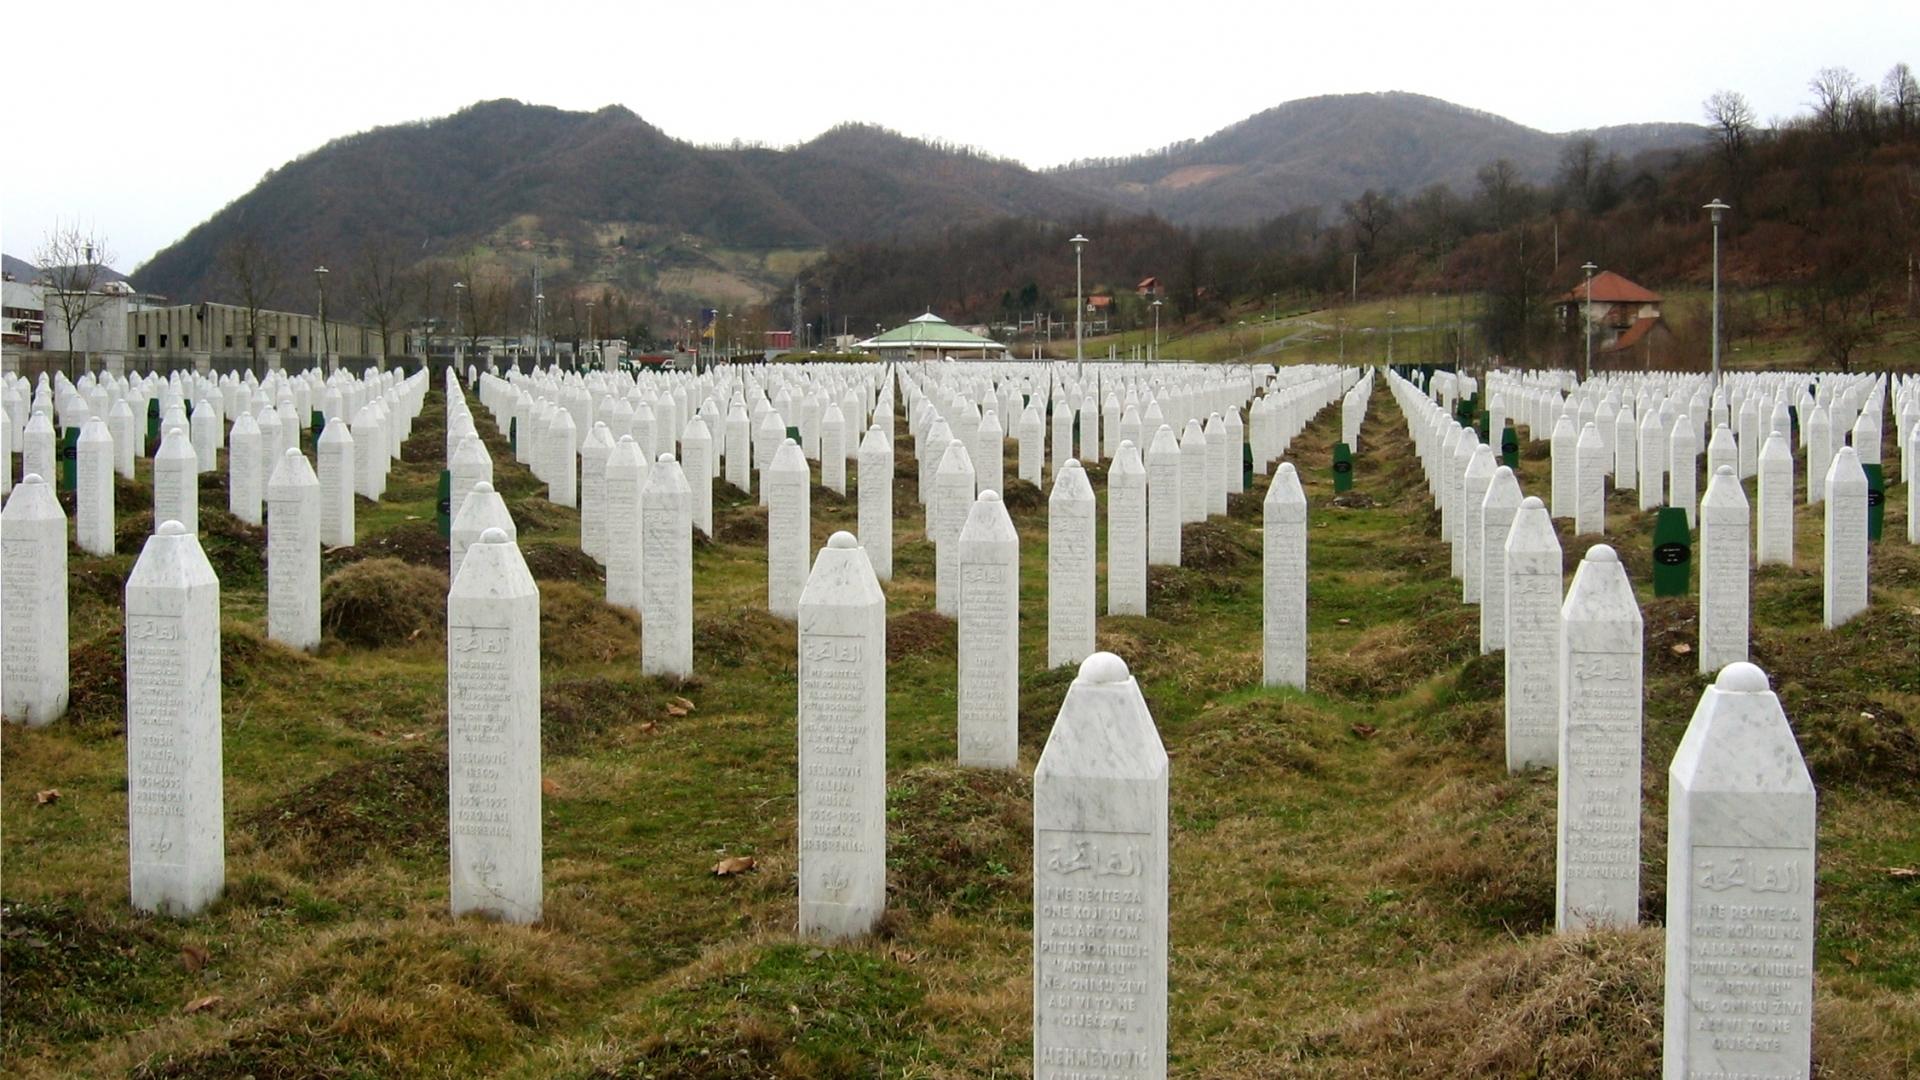 Srebrenica_massacre_memorial_gravestones_2009_1-e1426258582102